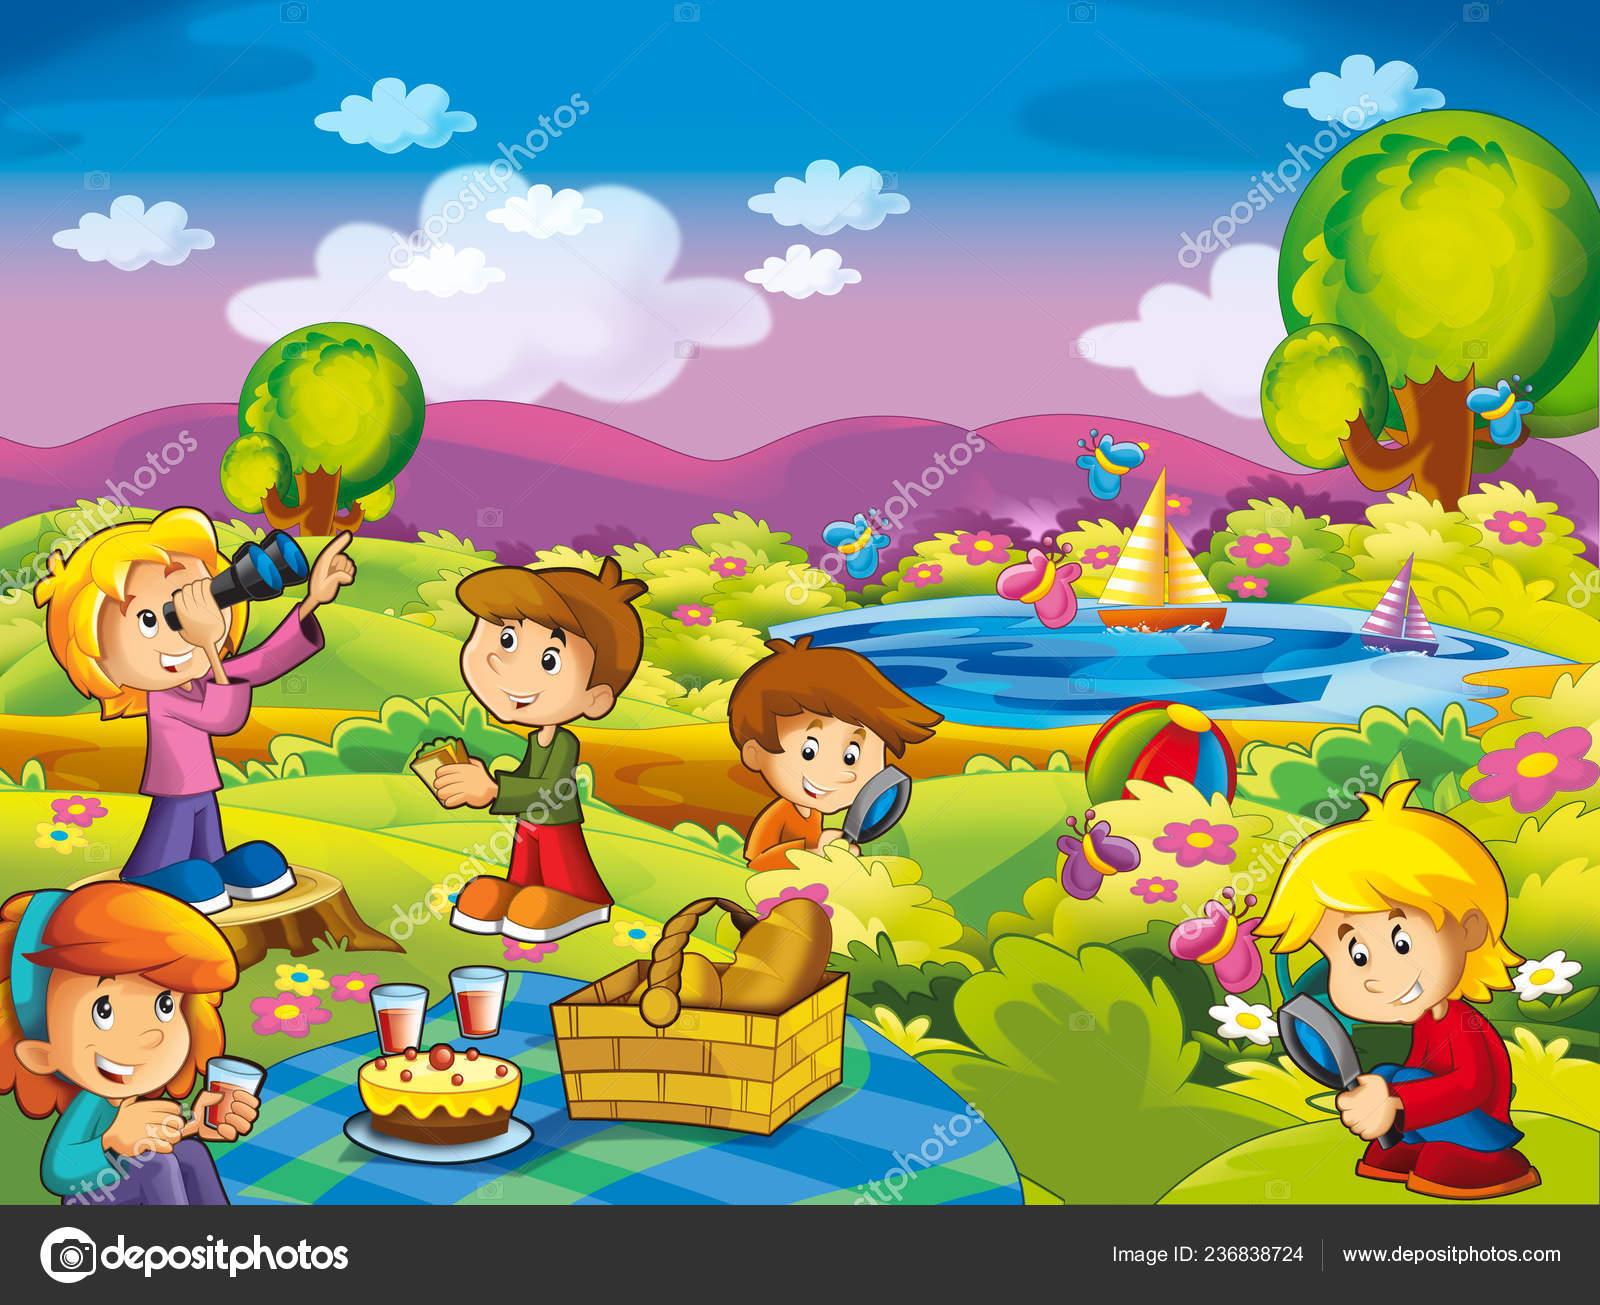 Cartoon Summer Nature Background Lake Kids Having Fun Picnic Illustration Stock Photo C Illustrator Hft 236838724